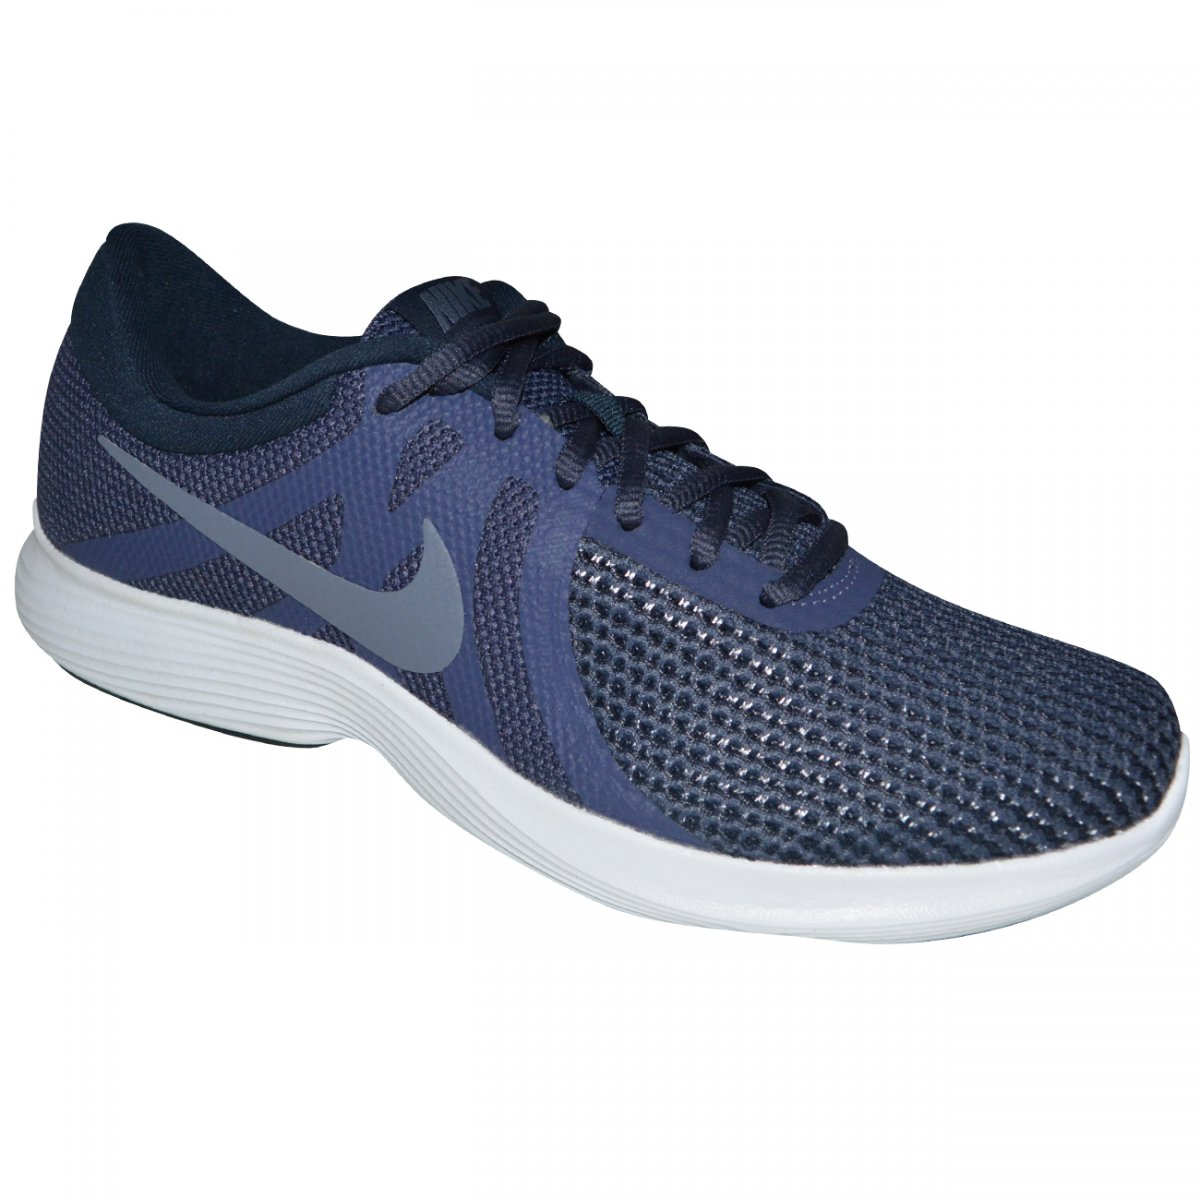 Tenis Nike Revolution 4 908988 500 - Marinho marinho cinza - Chuteira Nike 3e9d63bb32853